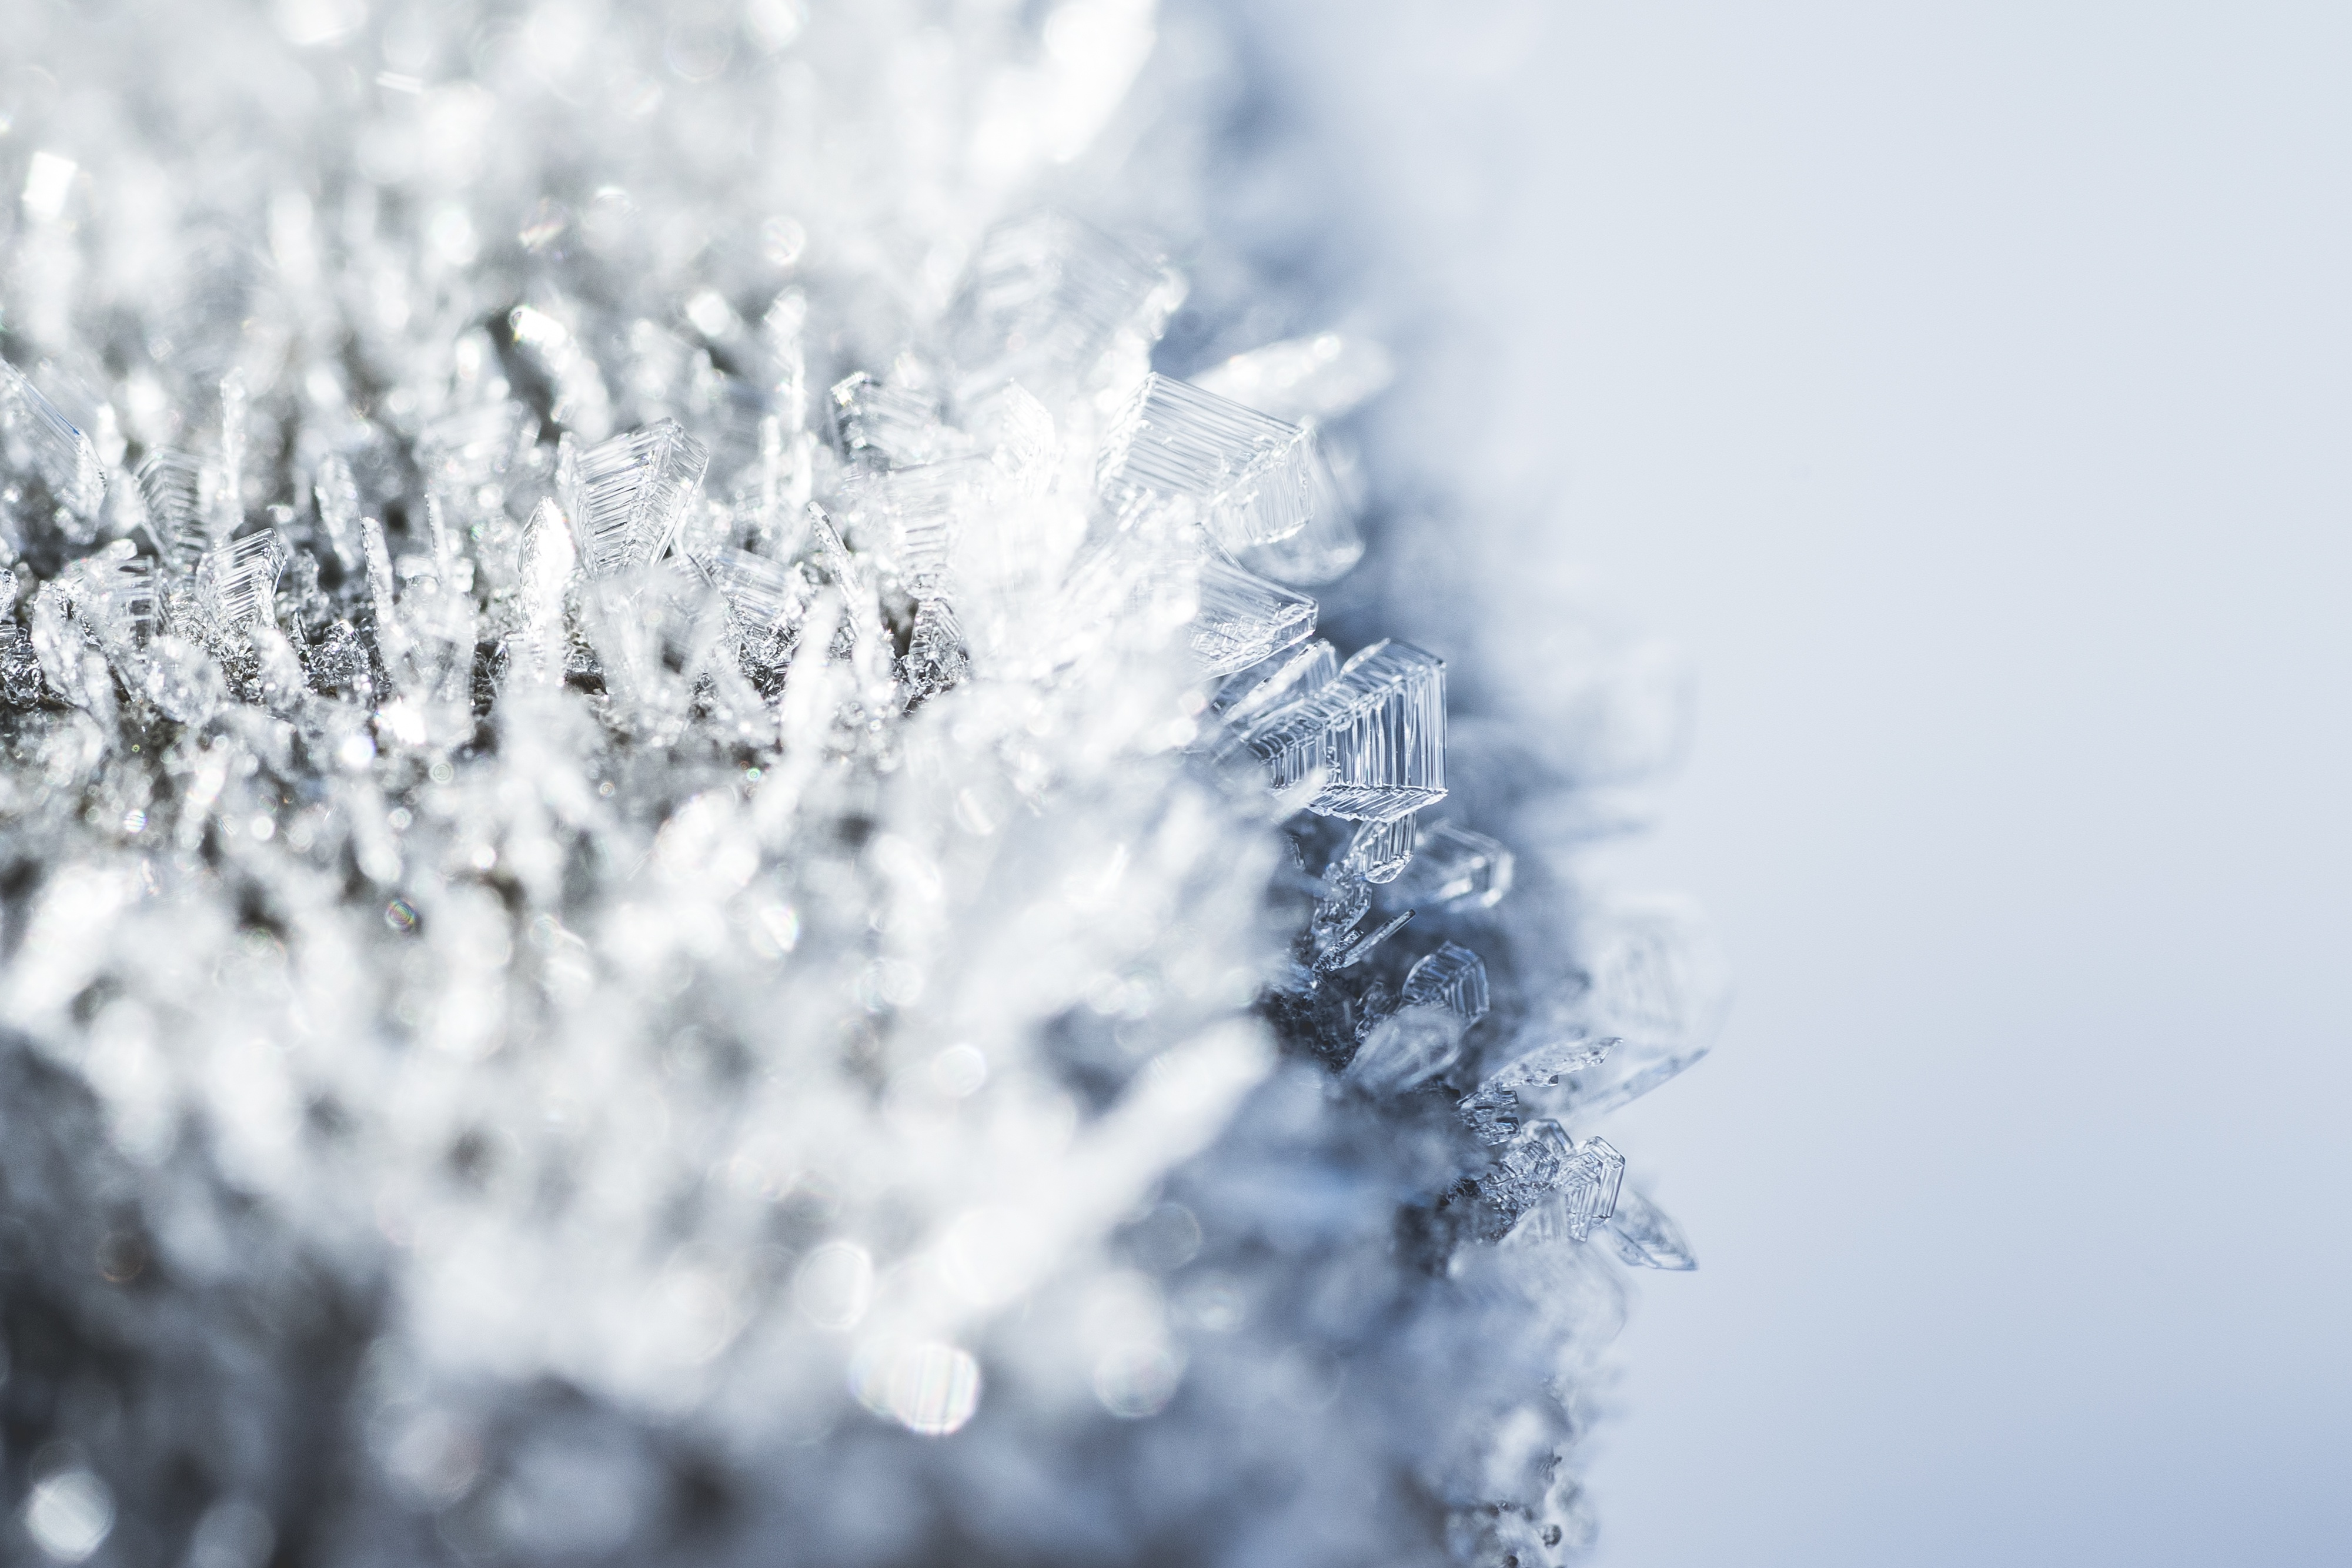 morning-hoar-frost-frozen-snowflakes-close-up-picjumbo-com.jpg